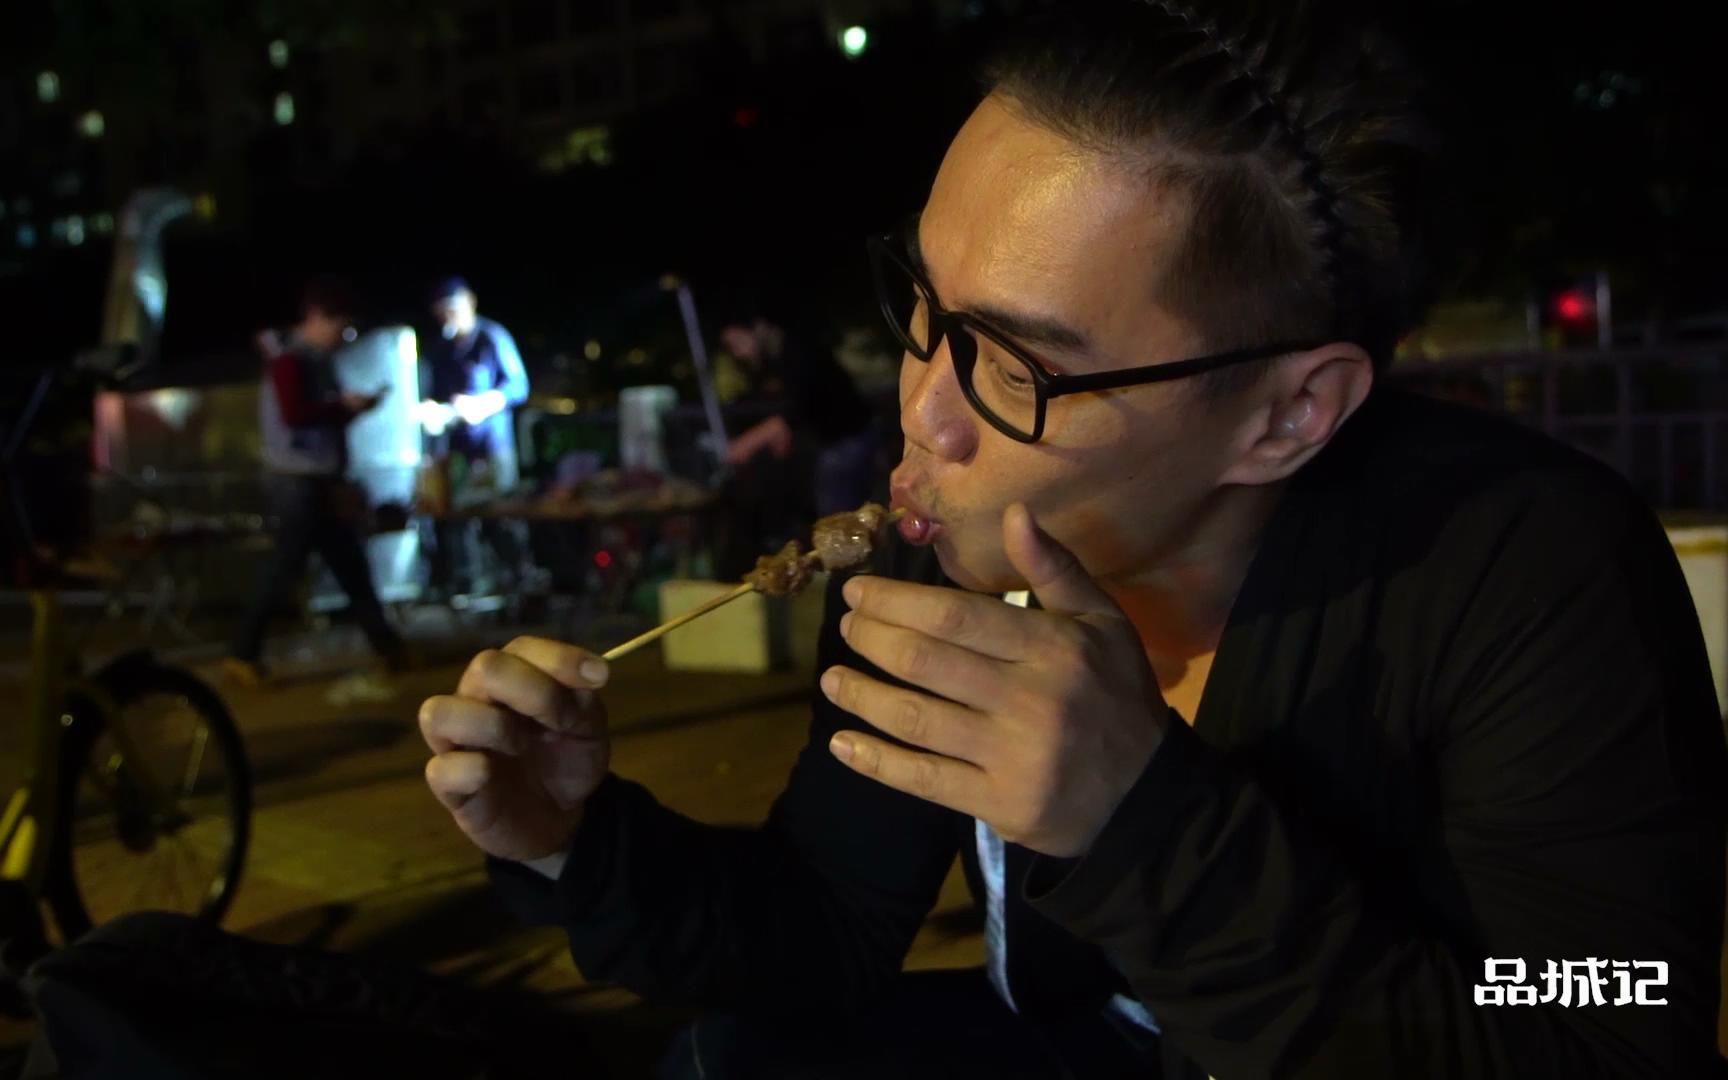 【品城記】探店︱五星級酒店大廚轉戰街邊做燒烤,來這兒宵夜真的很夠味!_嗶哩嗶哩 (゜-゜)つロ 干杯~-bilibili